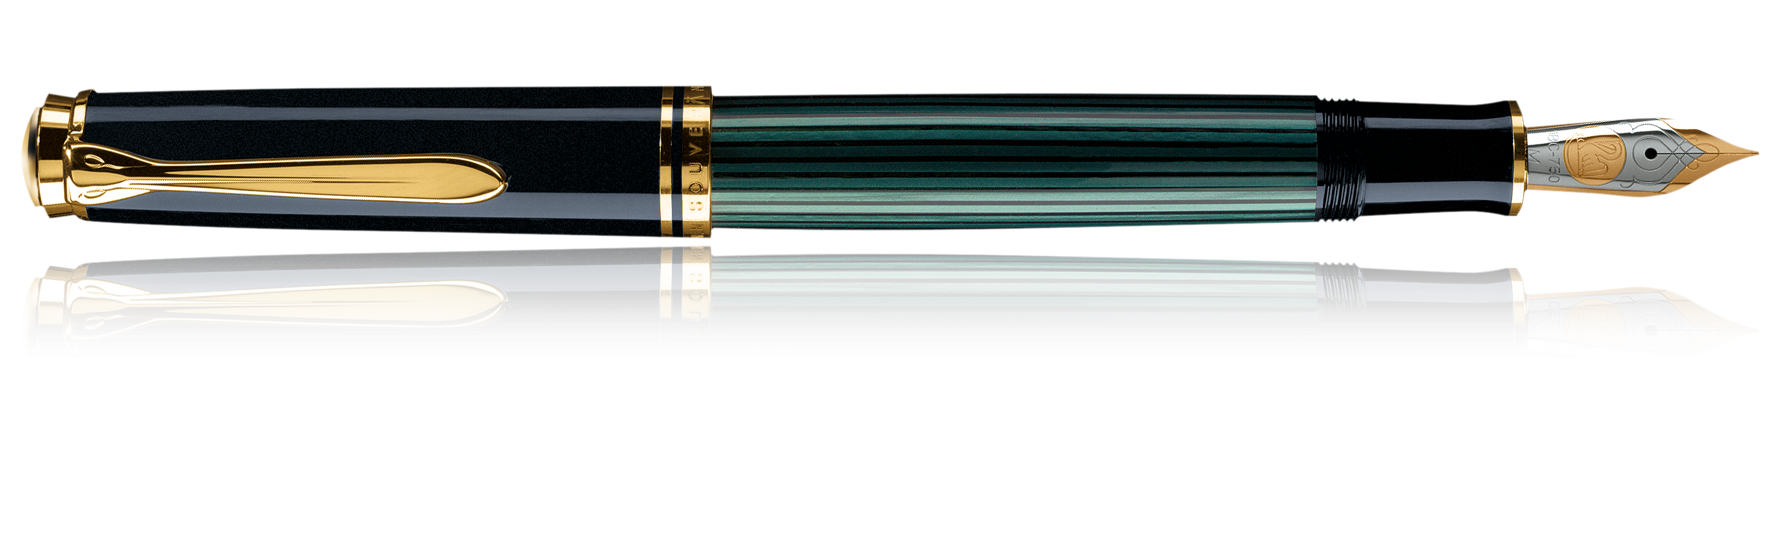 Pelikan Souveran M800 Black and Green Fountain Pen